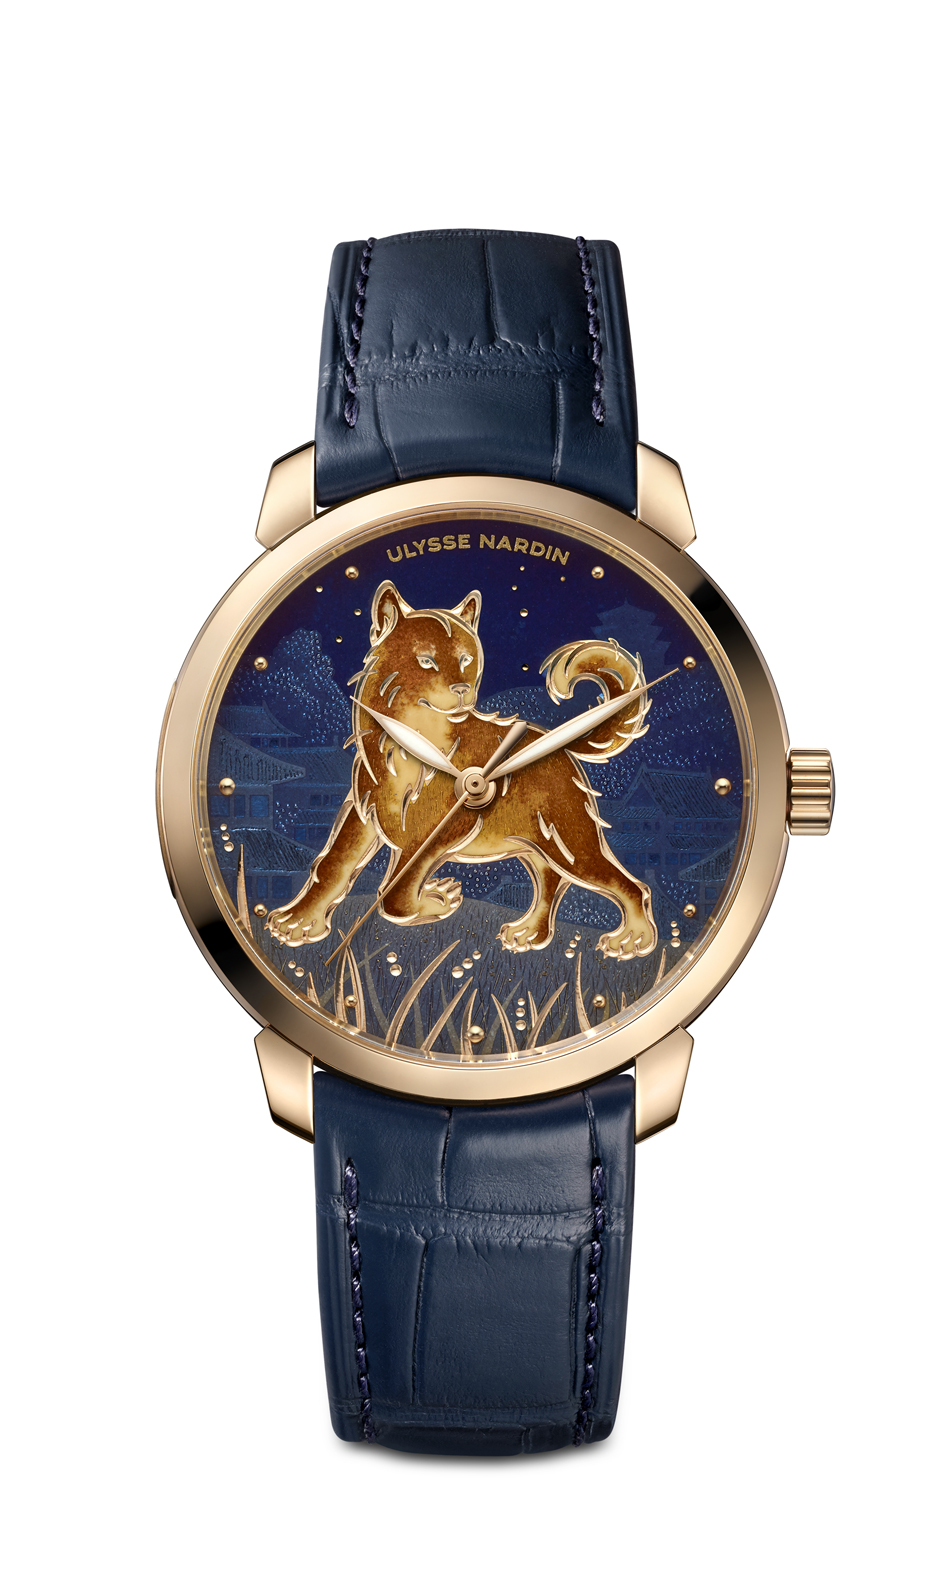 Ulysse Nardin Classico Year of the Dog, $39,800